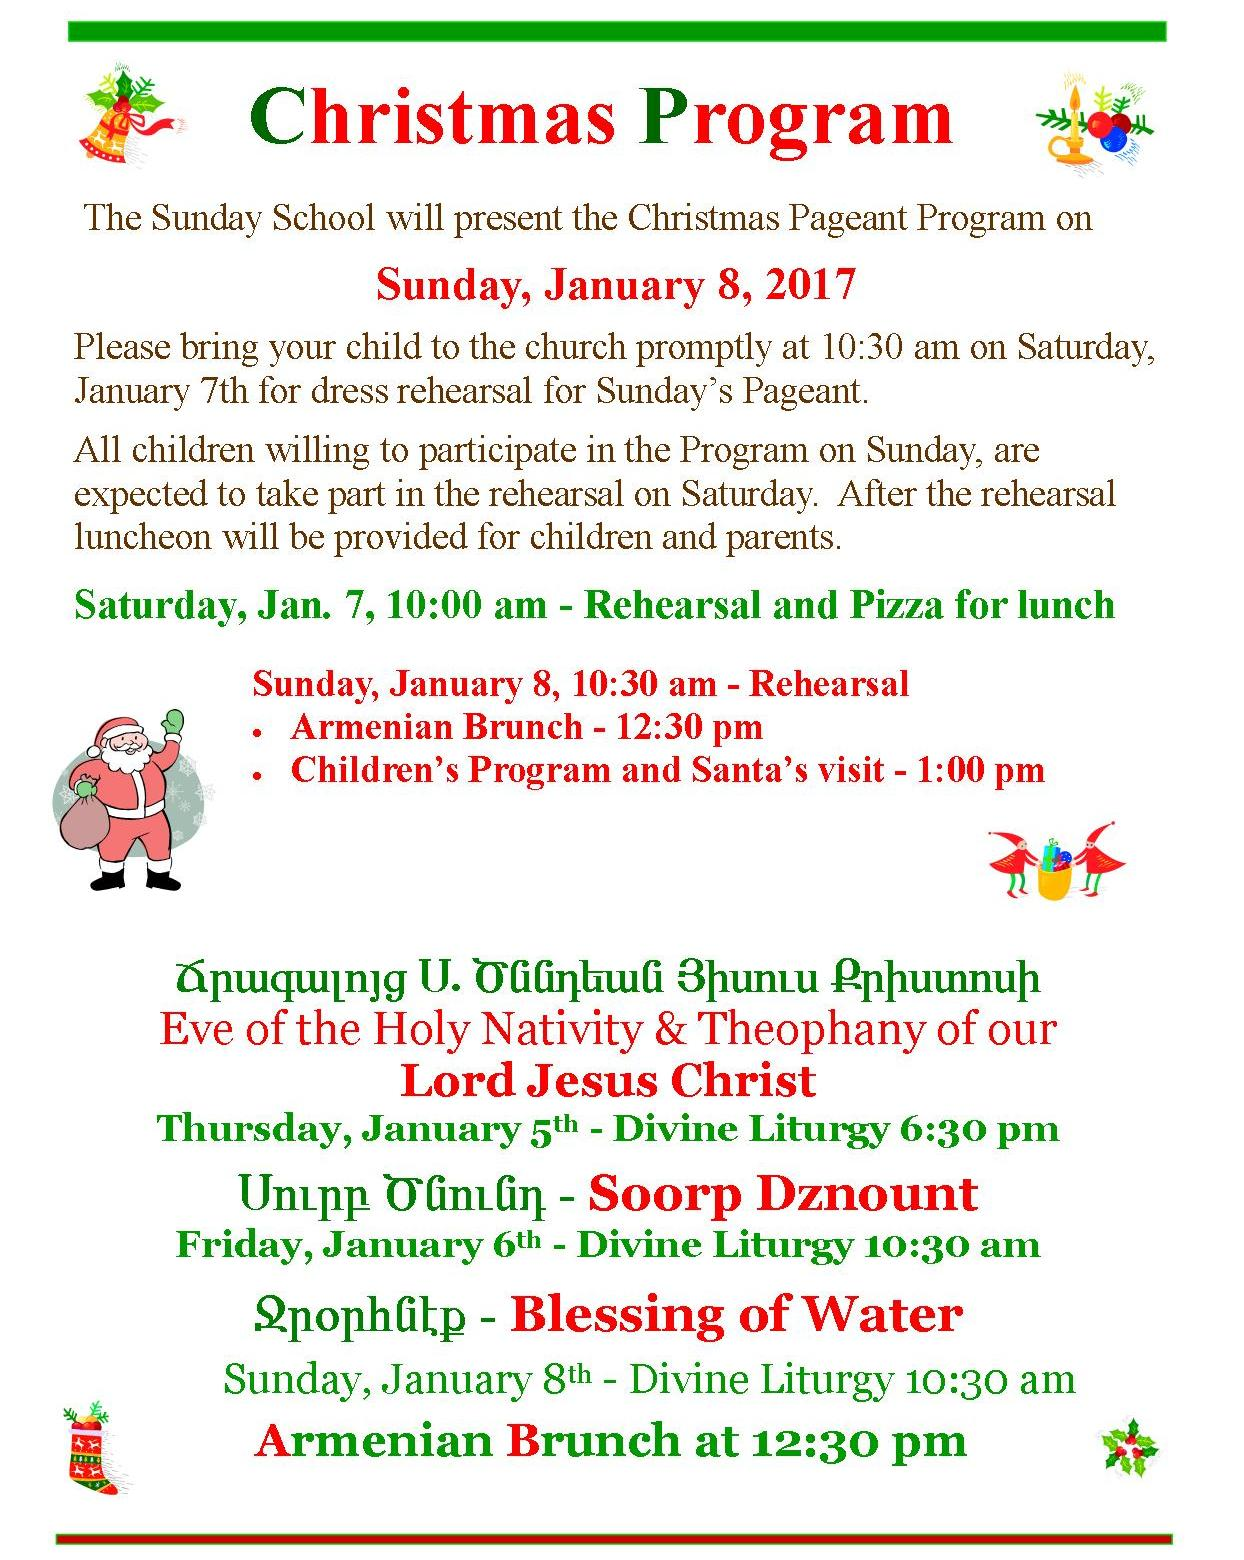 Church christmas programs - Ft Lauderdale Hollywood